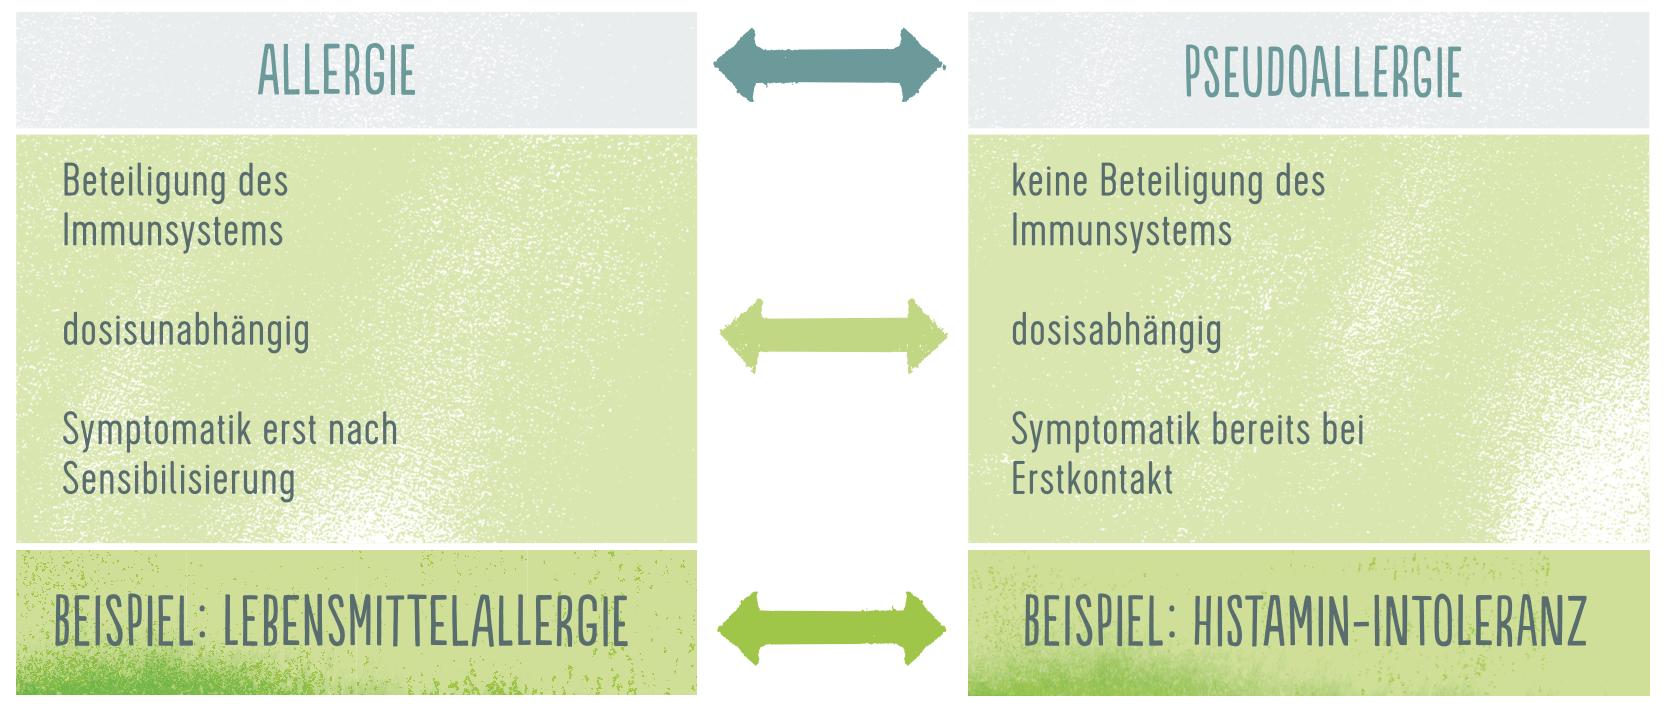 Allergie vs. Pseudoallergie